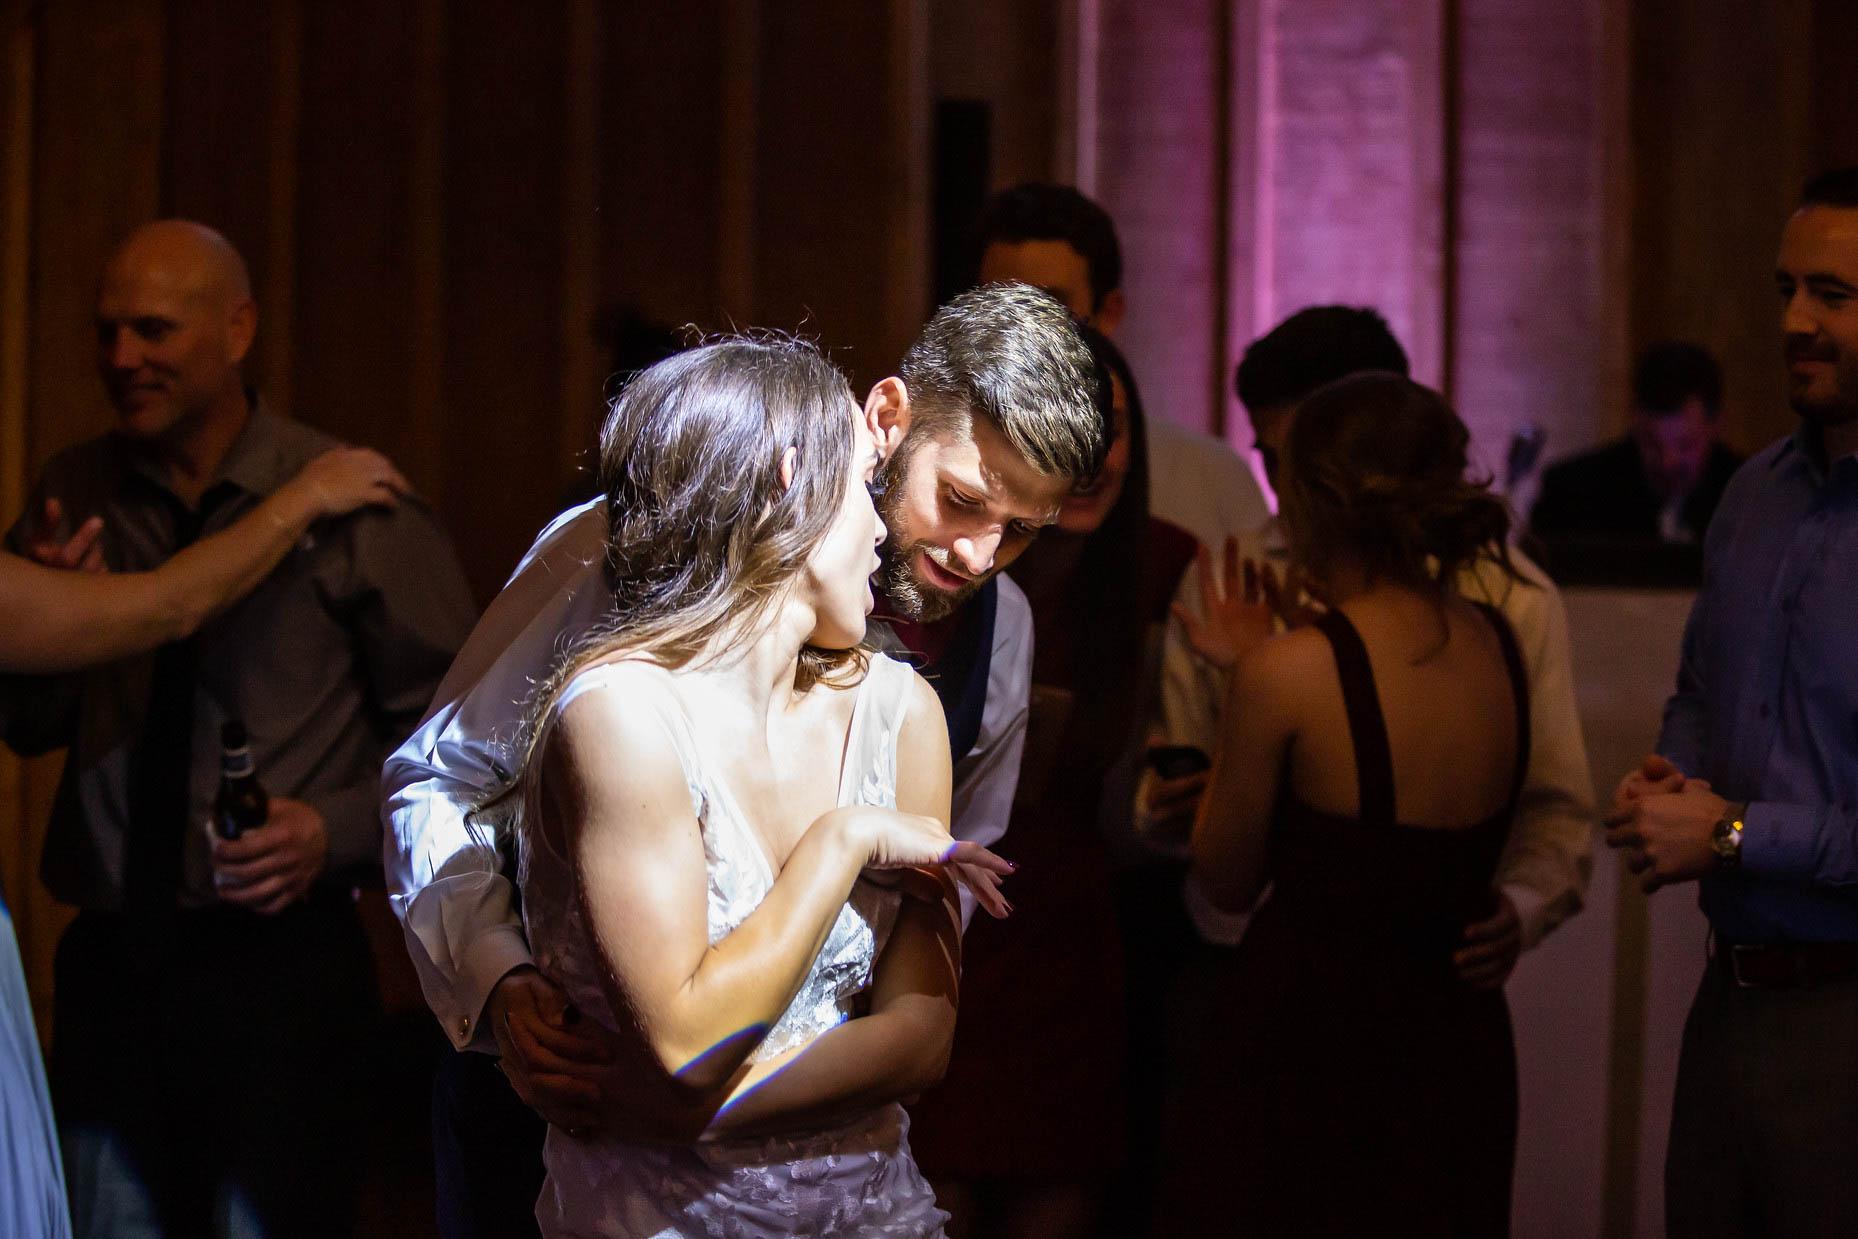 adam-szarmack-bowing-oaks-wedding-photographer-jacksonville-127.jpg